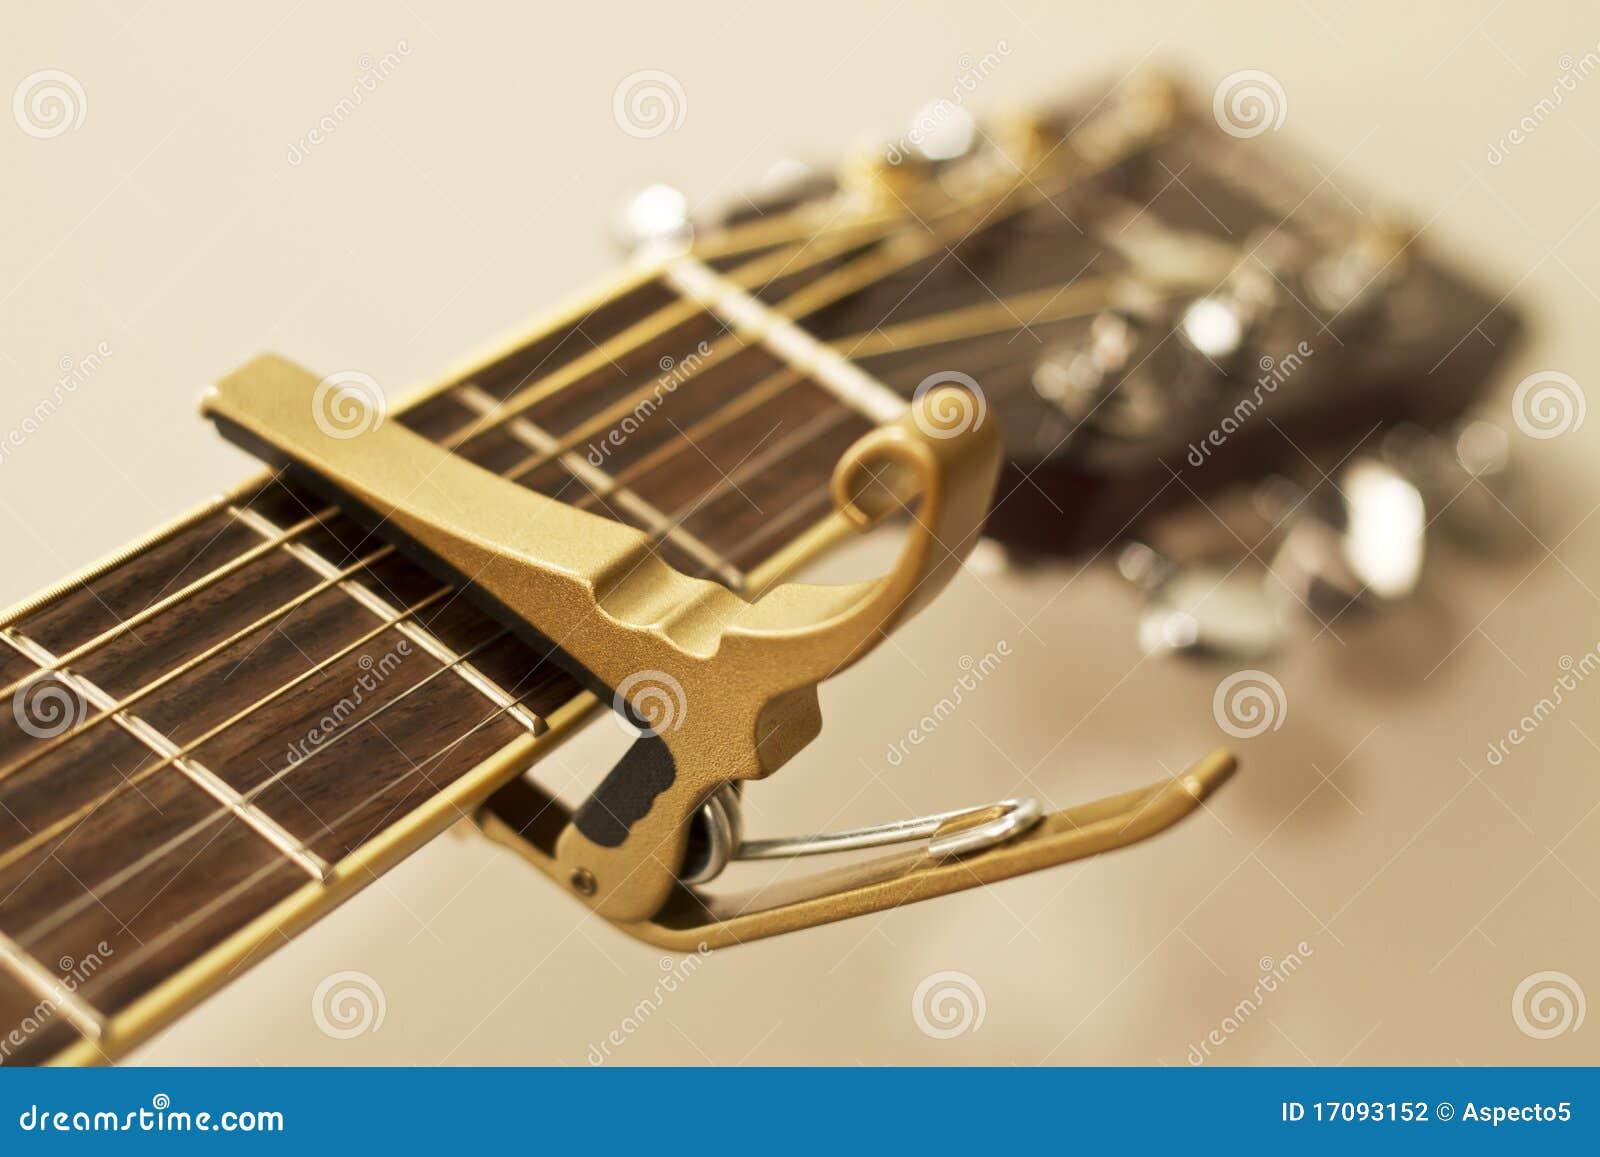 GitarreCapo.